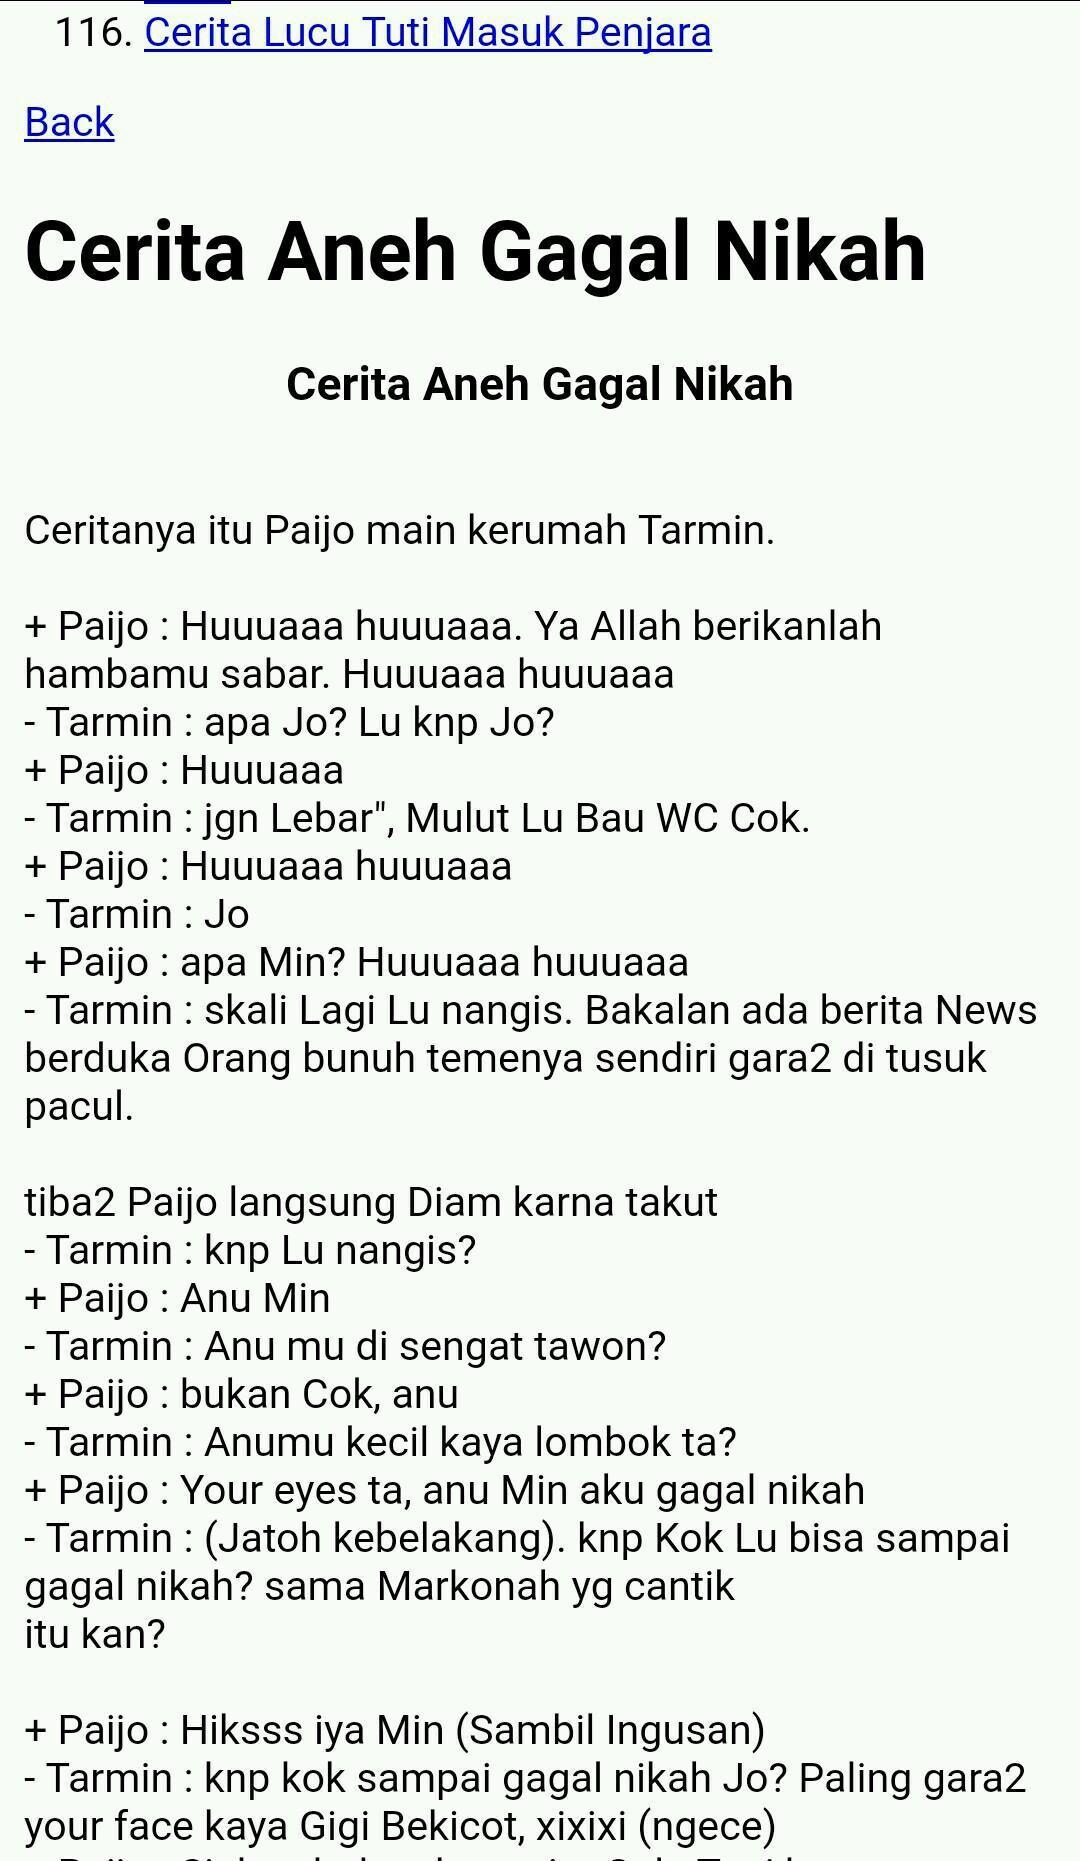 Cerita Dijamin Lucu Gokil For Android APK Download